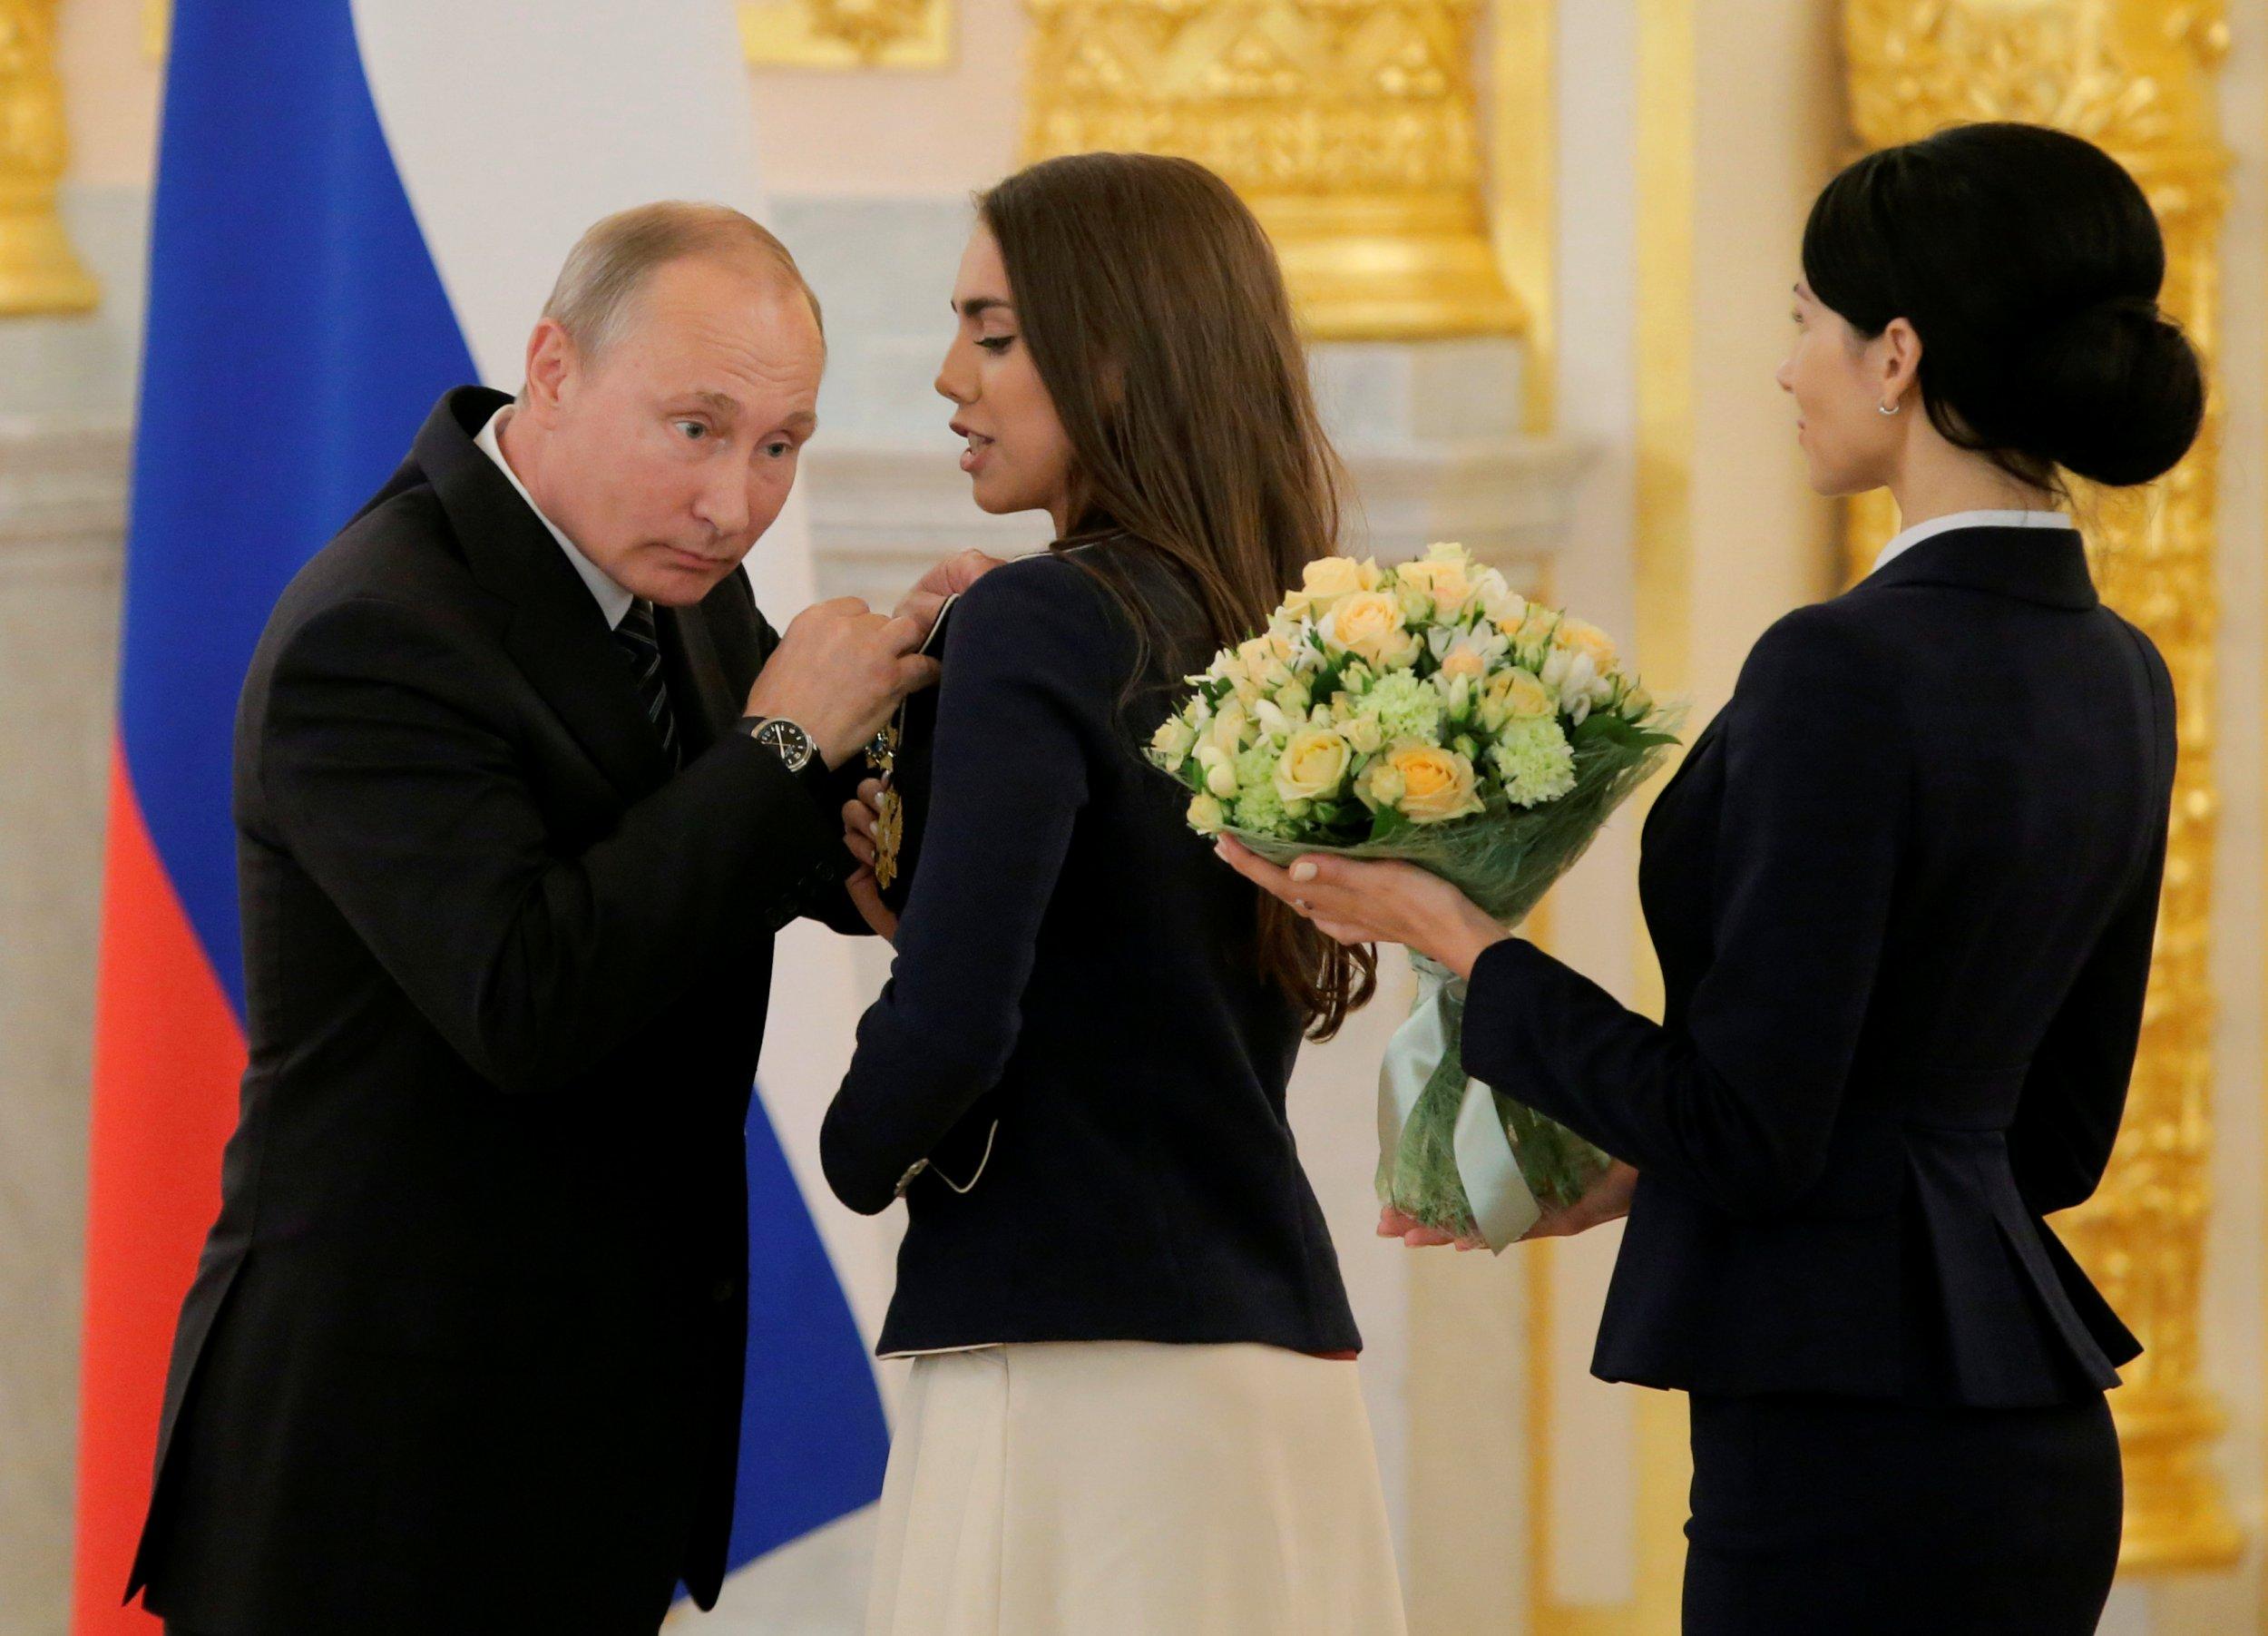 Putin and athlete